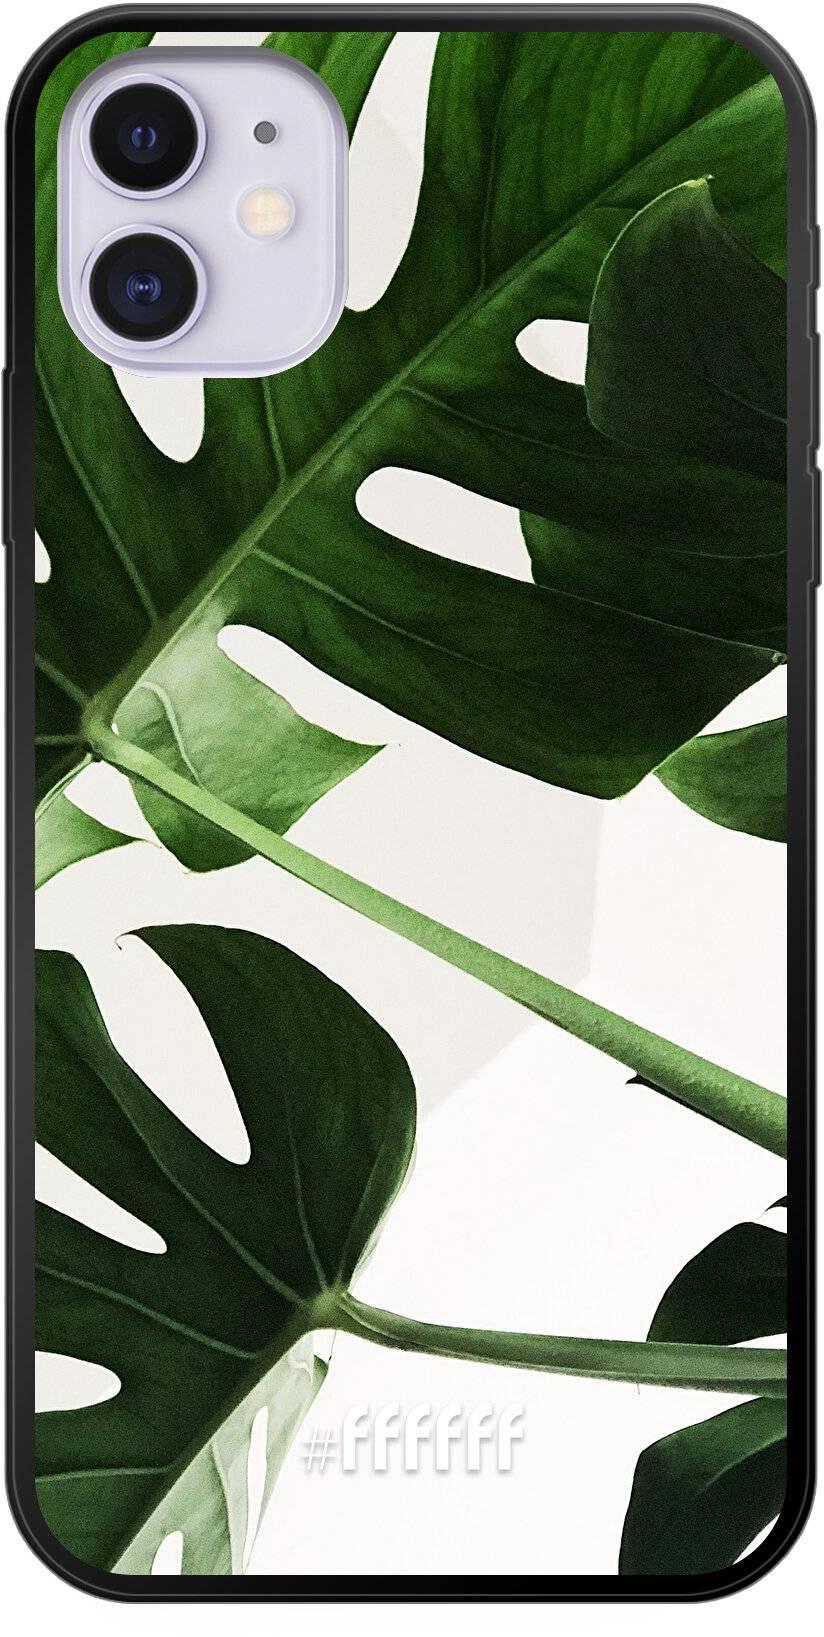 Tropical Plants iPhone 11